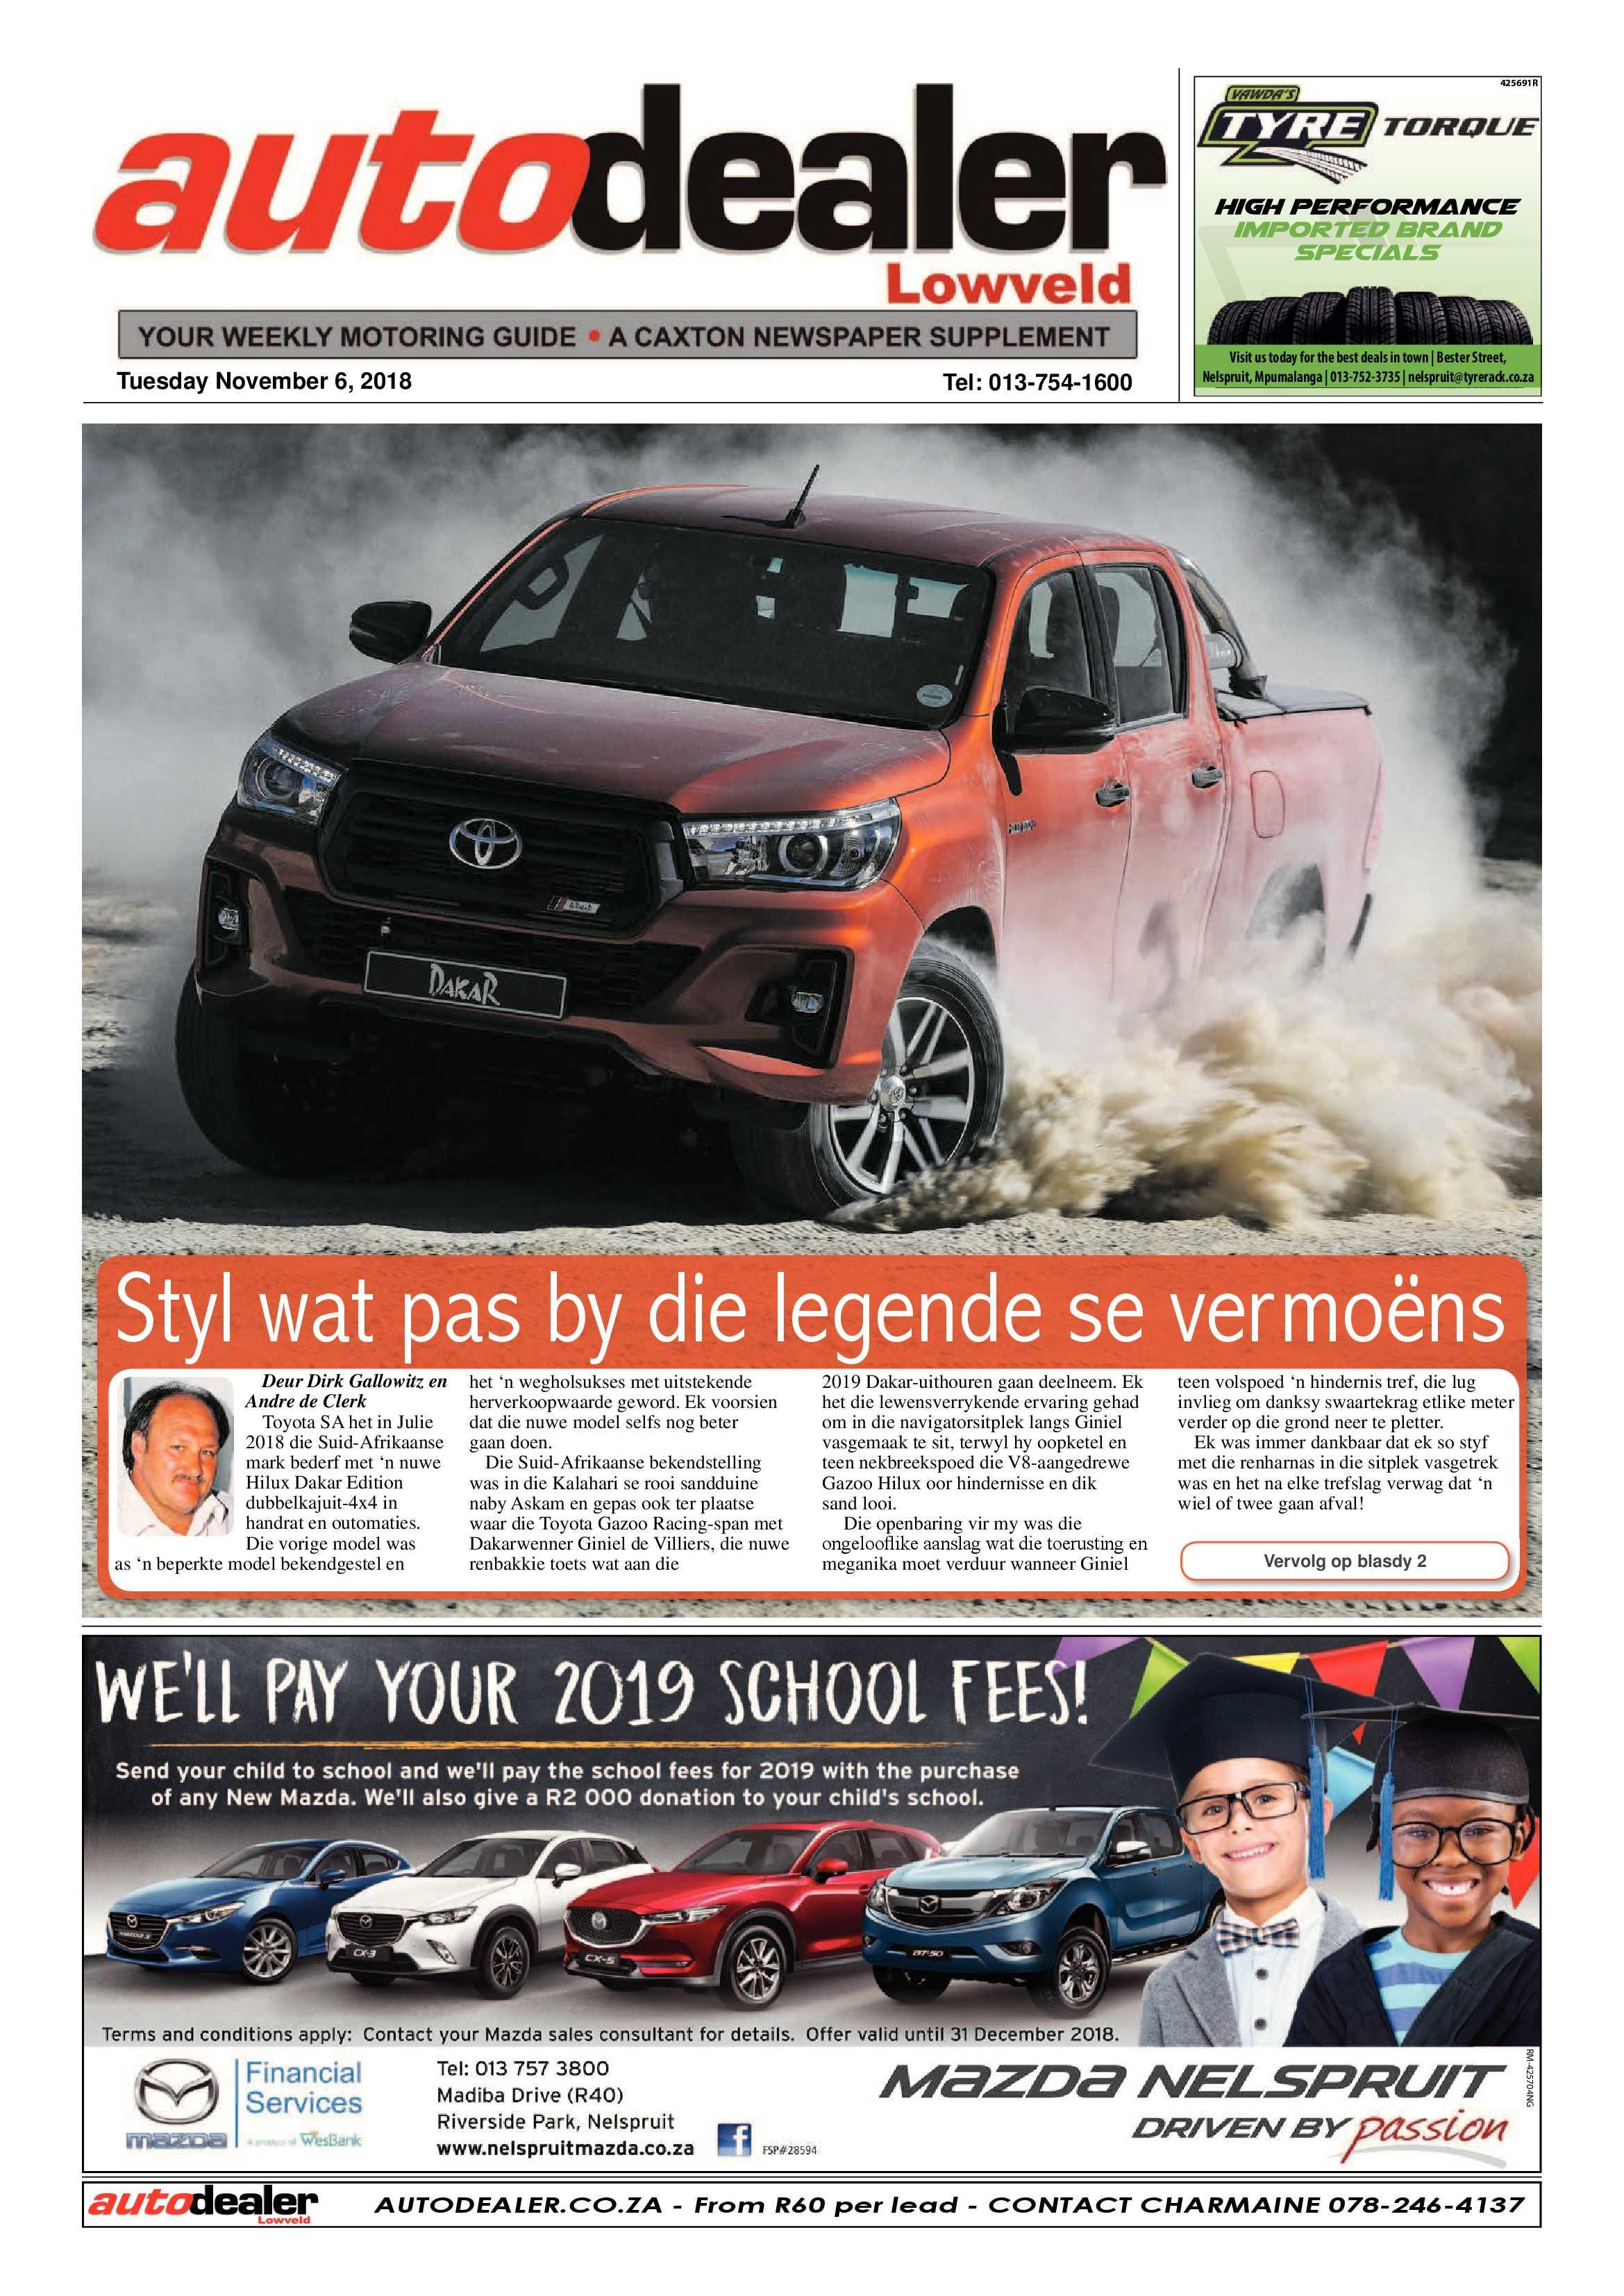 autodealer-6-november-2018-epapers-page-1